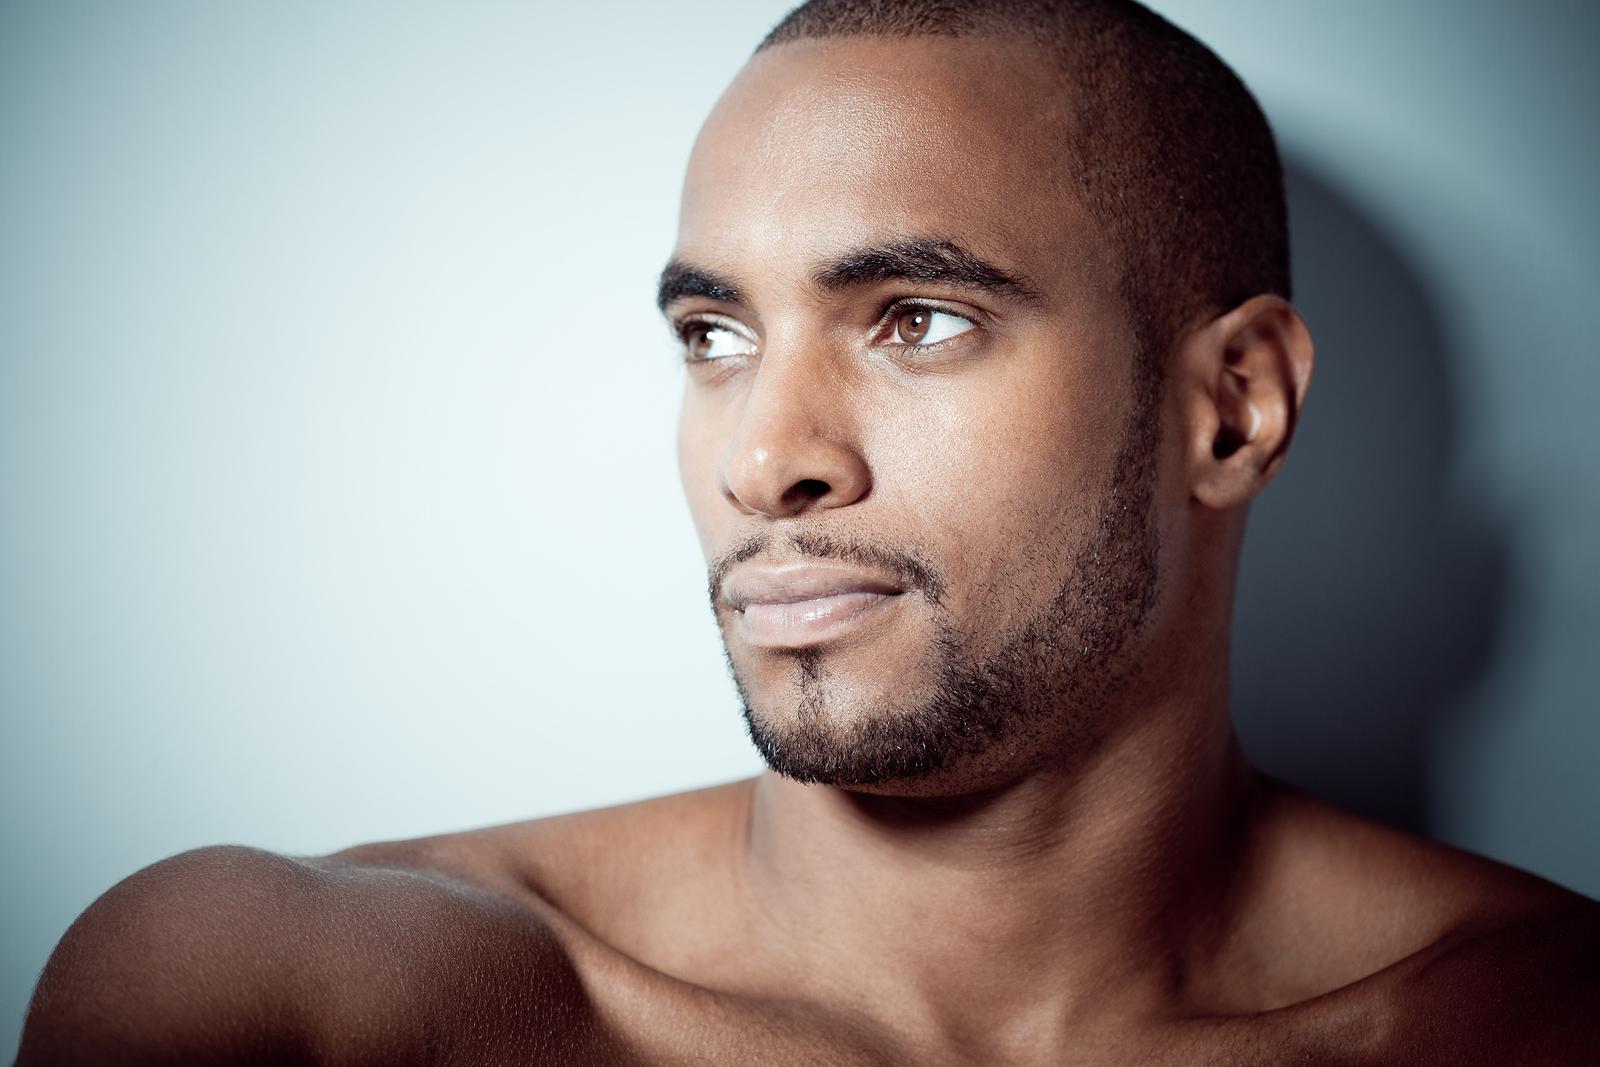 Beautiful black man portrait